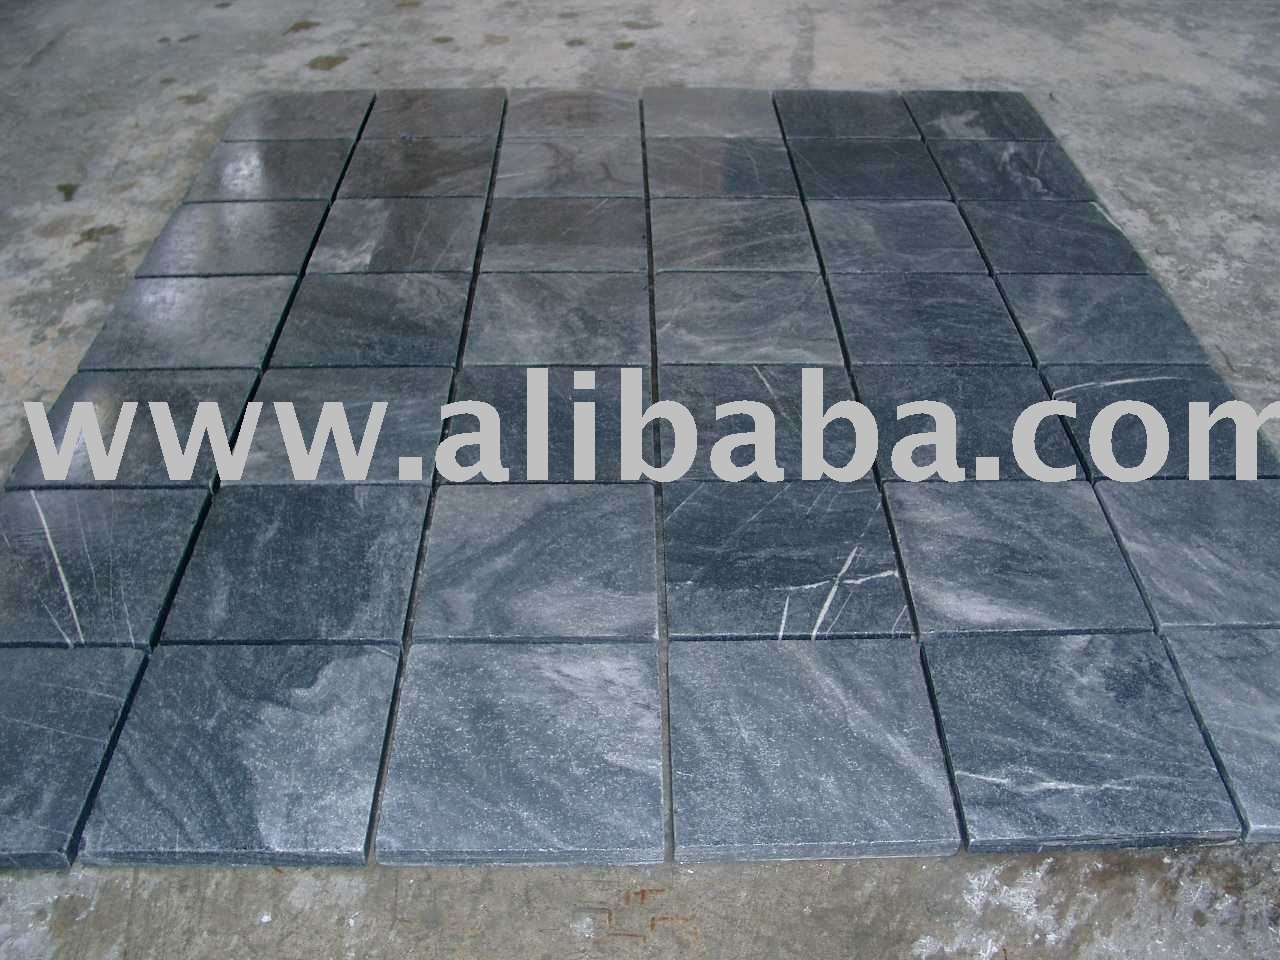 Tumbled Bluestone Tile Product On Alibaba